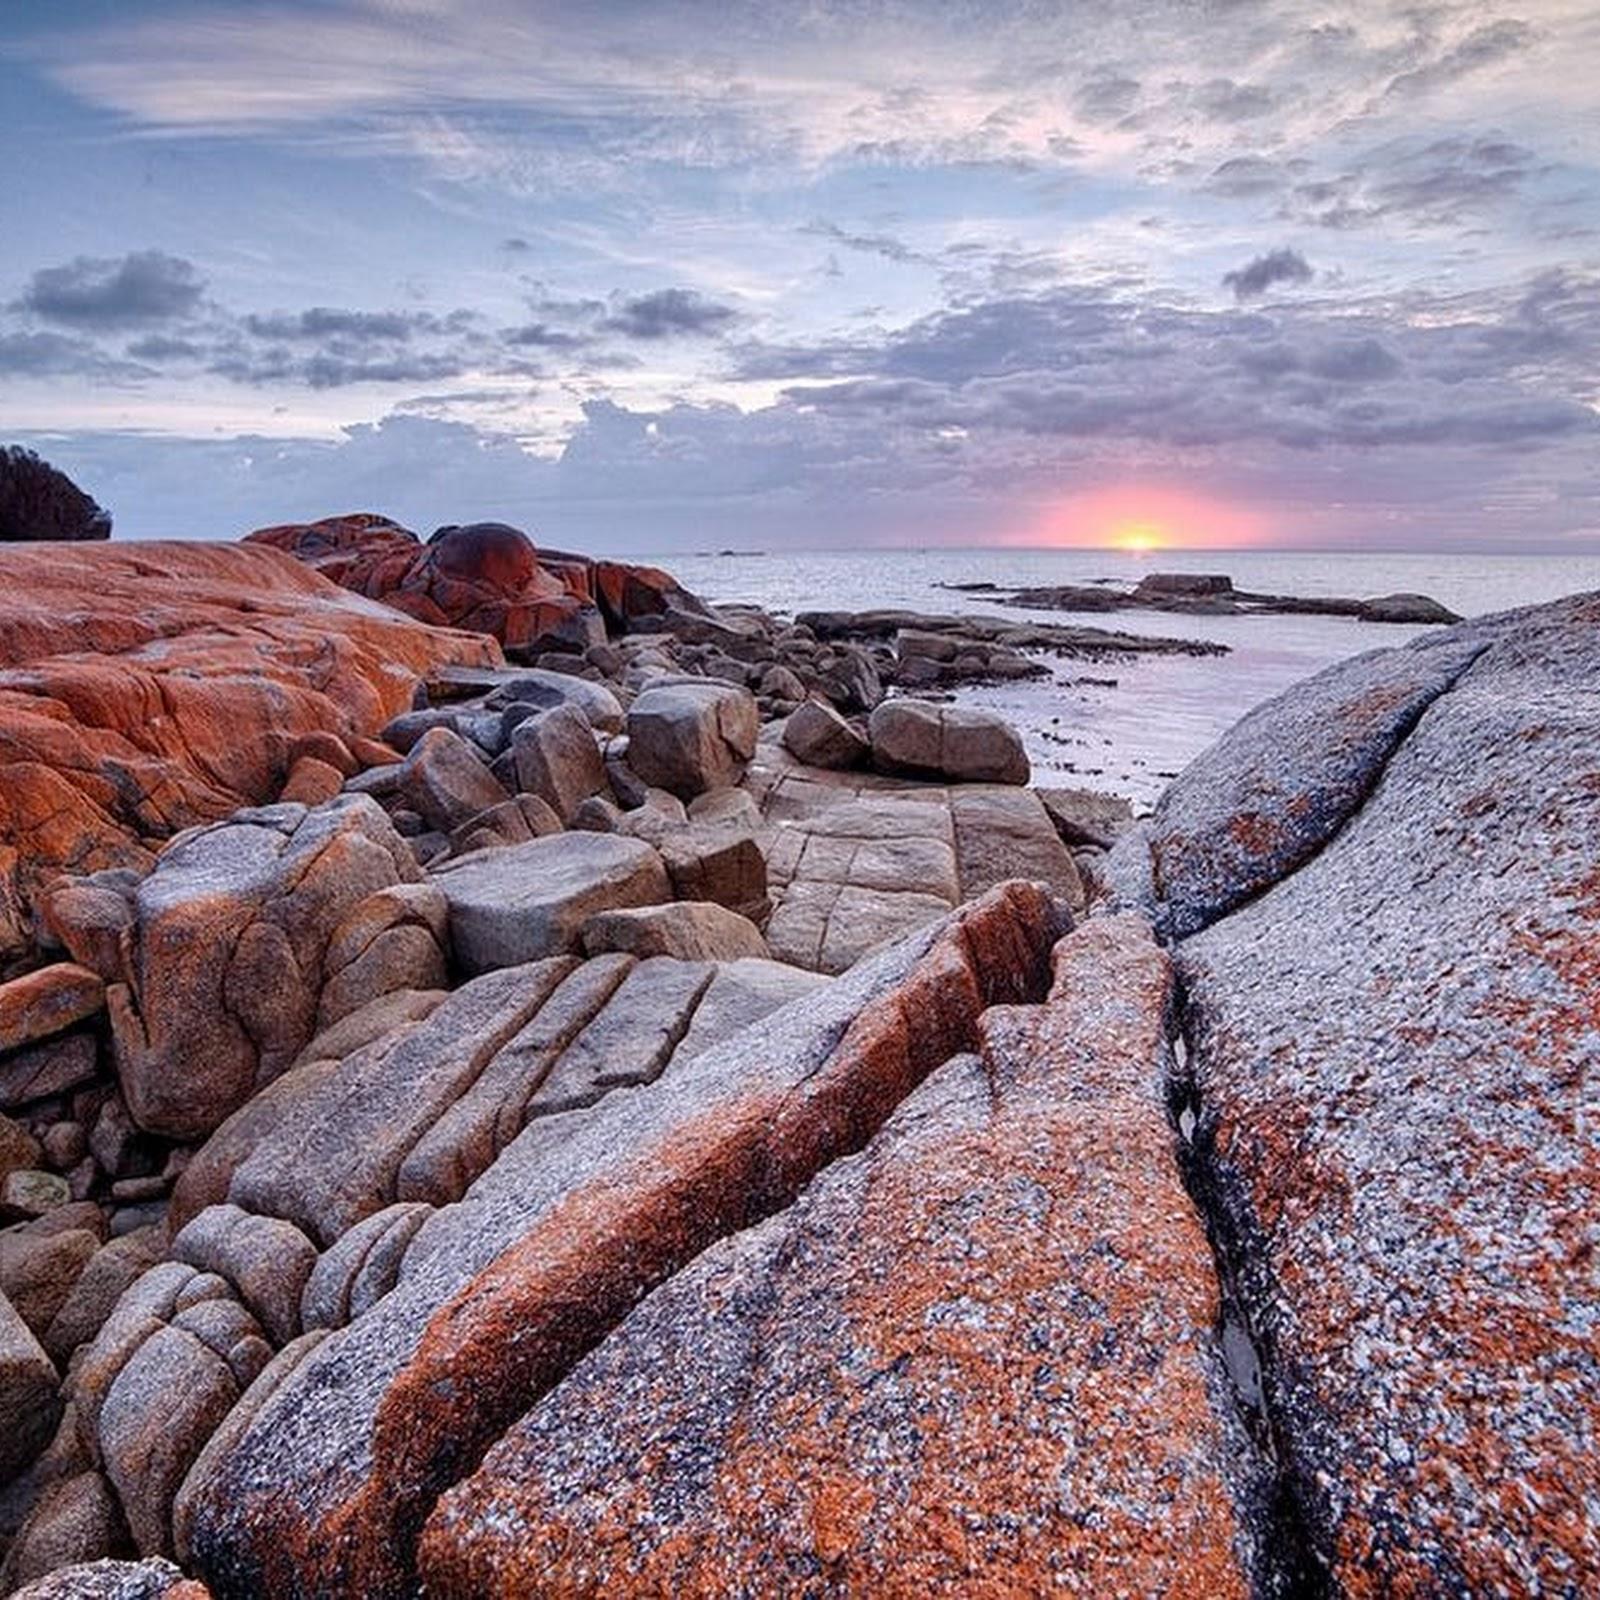 The Orange Rocks of Bay of Fires